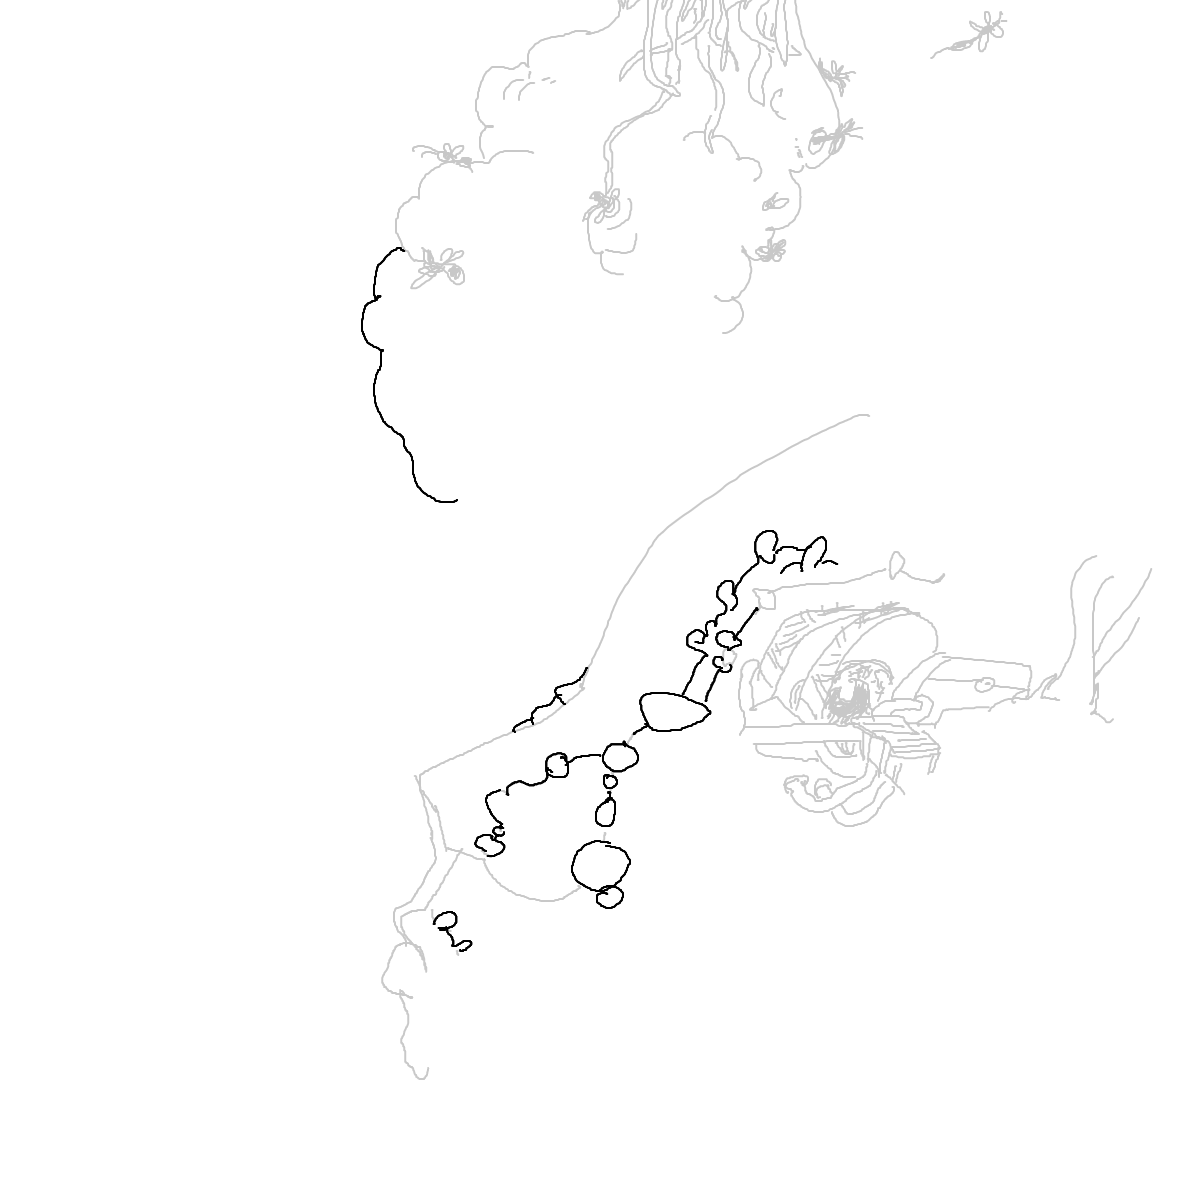 BAAAM drawing#22272 lat:78.4174575805664000lng: -4.4291262626647950